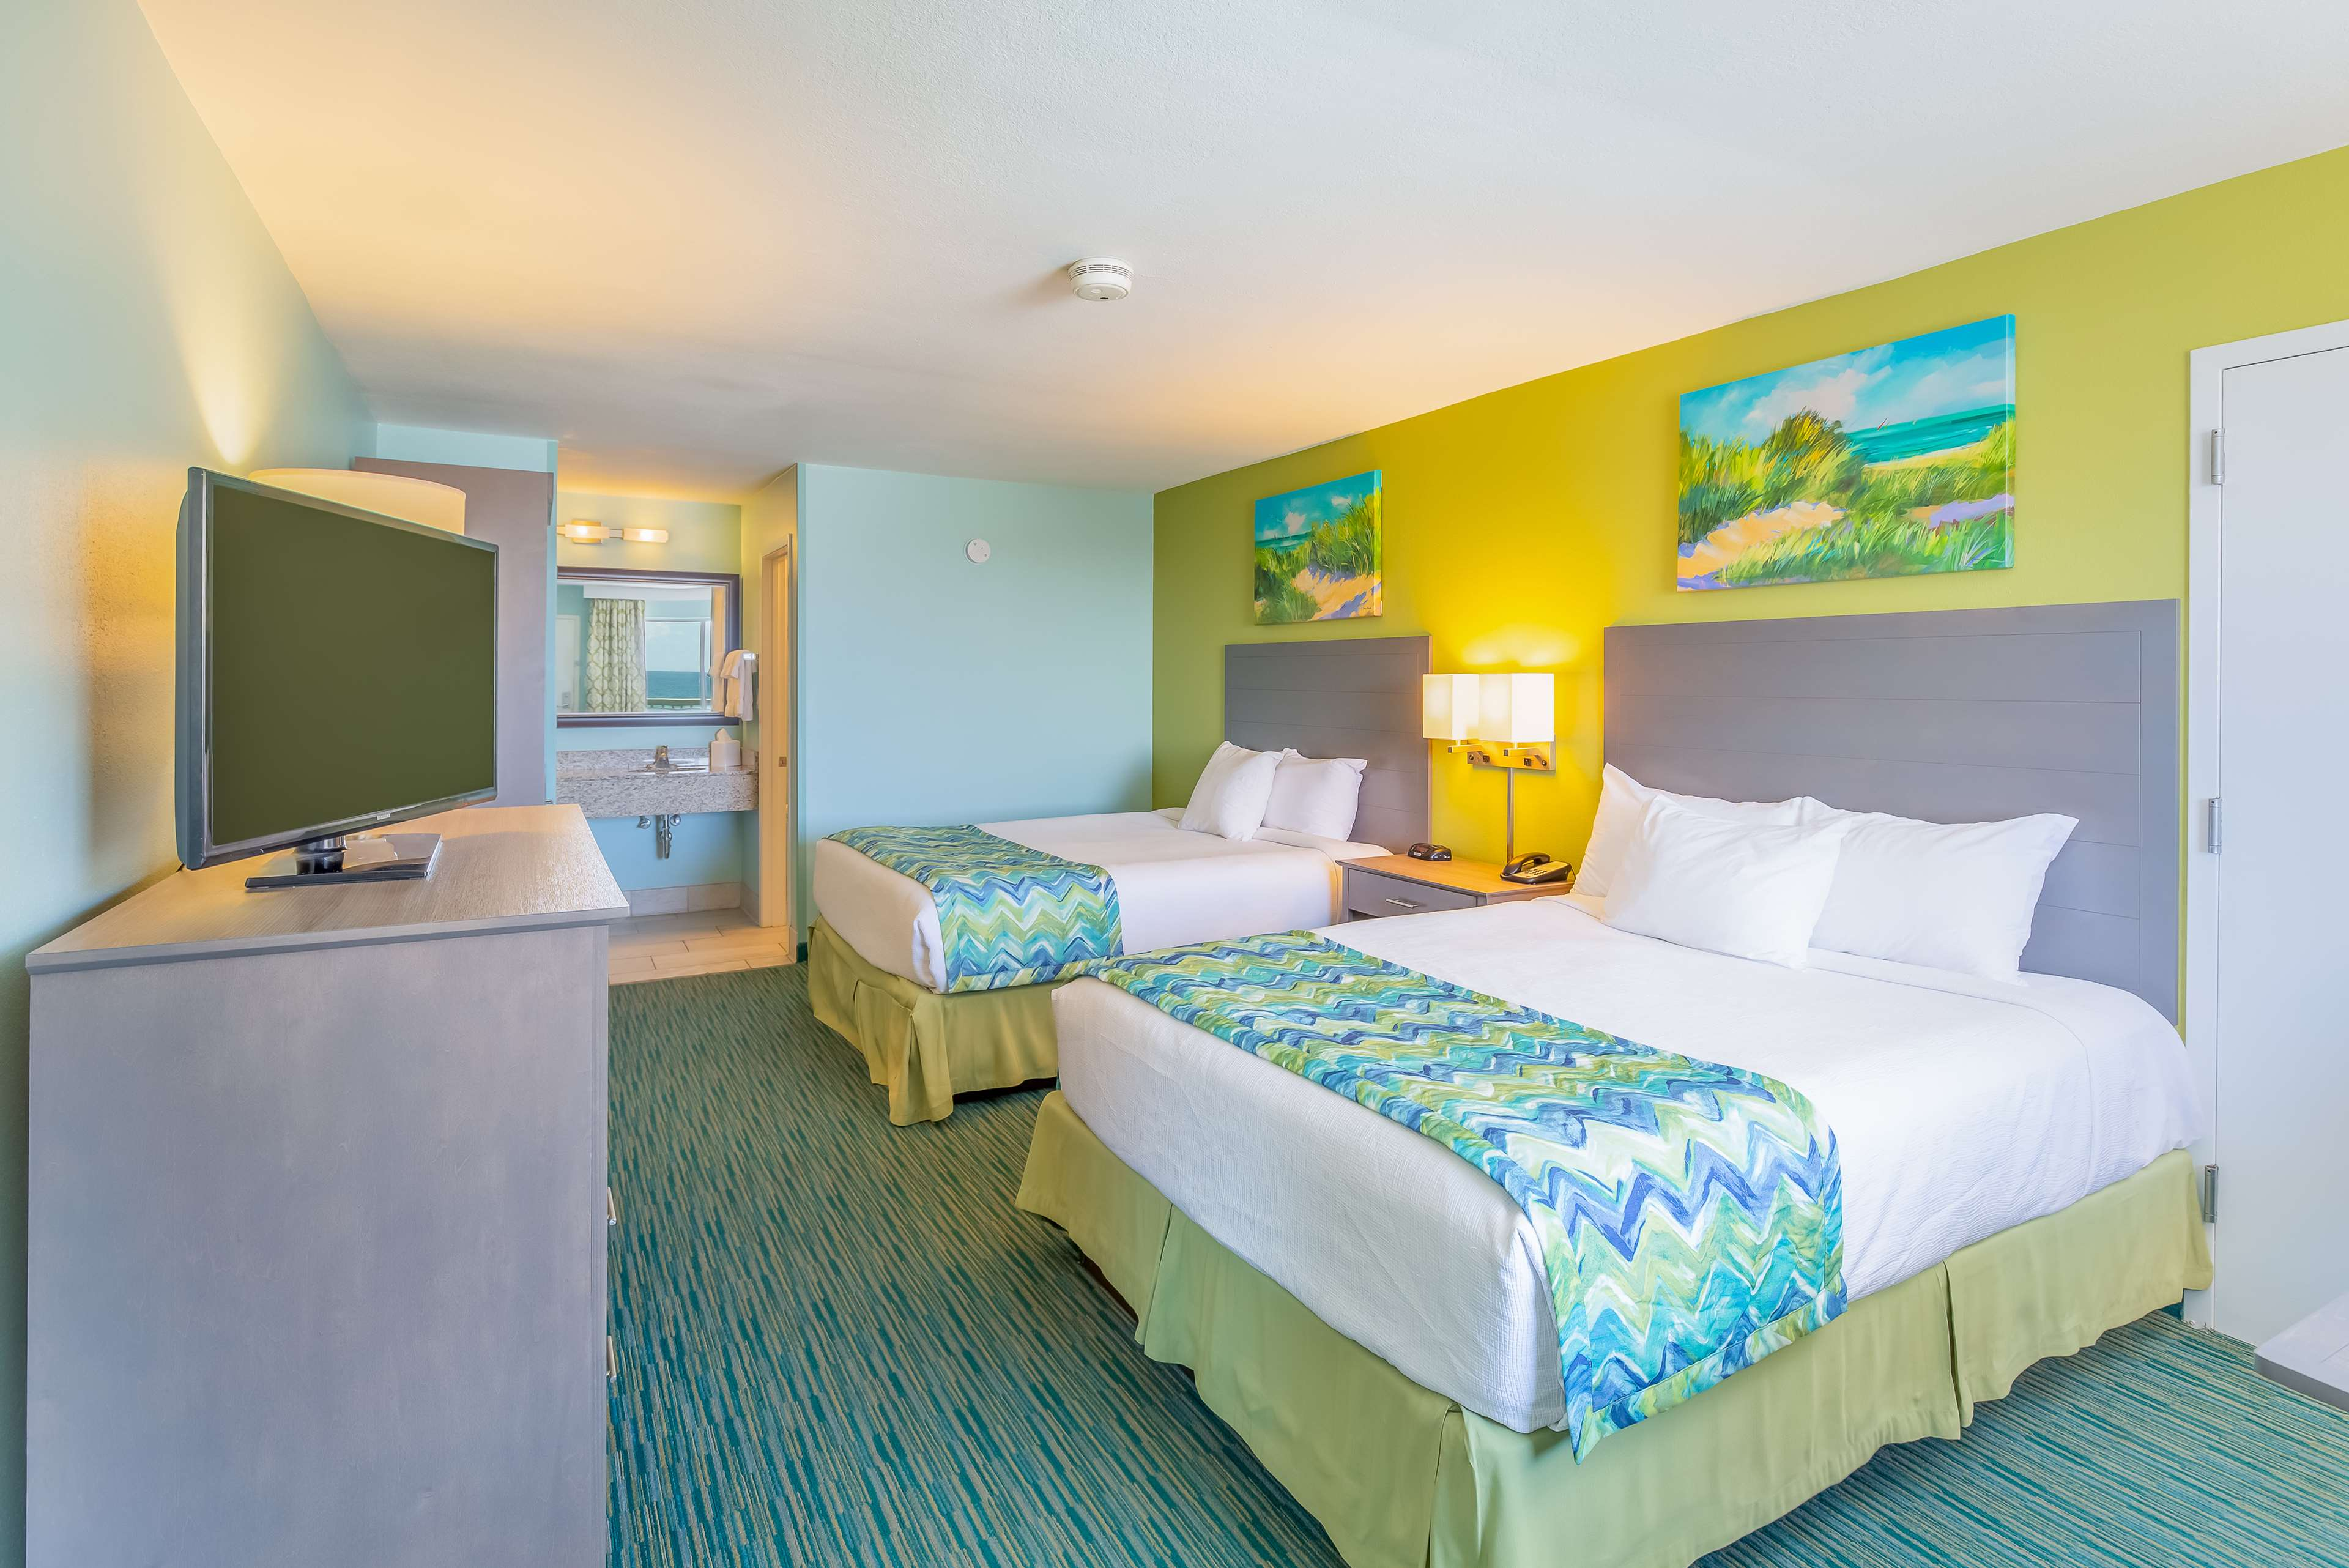 Best Western Beachside Resort image 21